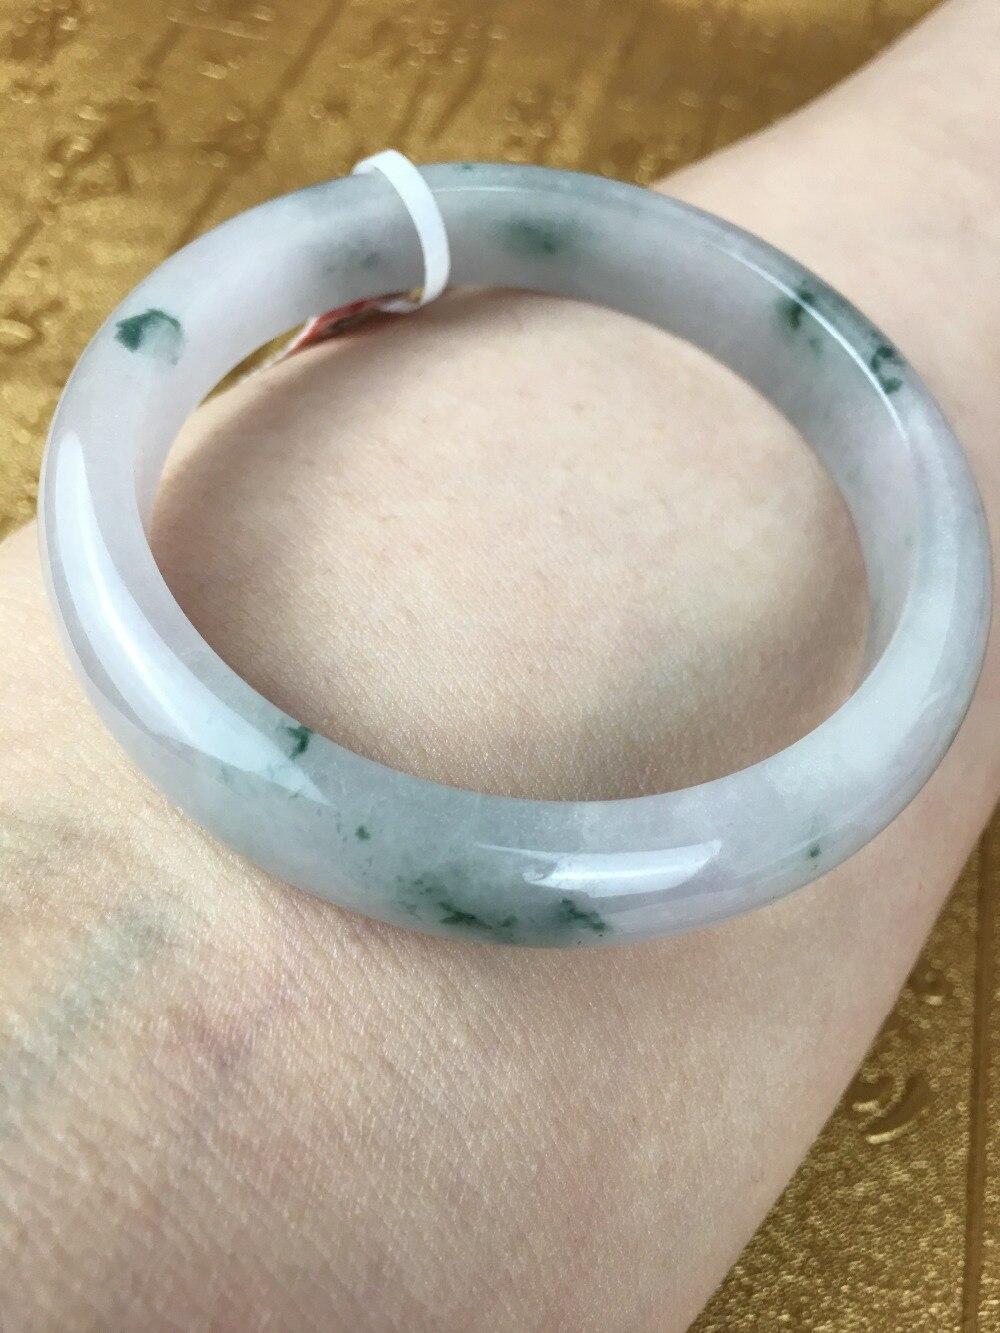 Send A certificate natural Jadeite bracelets Carved ice bottom floating blue 54-61mm womens bracelet Jewelry giftsSend A certificate natural Jadeite bracelets Carved ice bottom floating blue 54-61mm womens bracelet Jewelry gifts